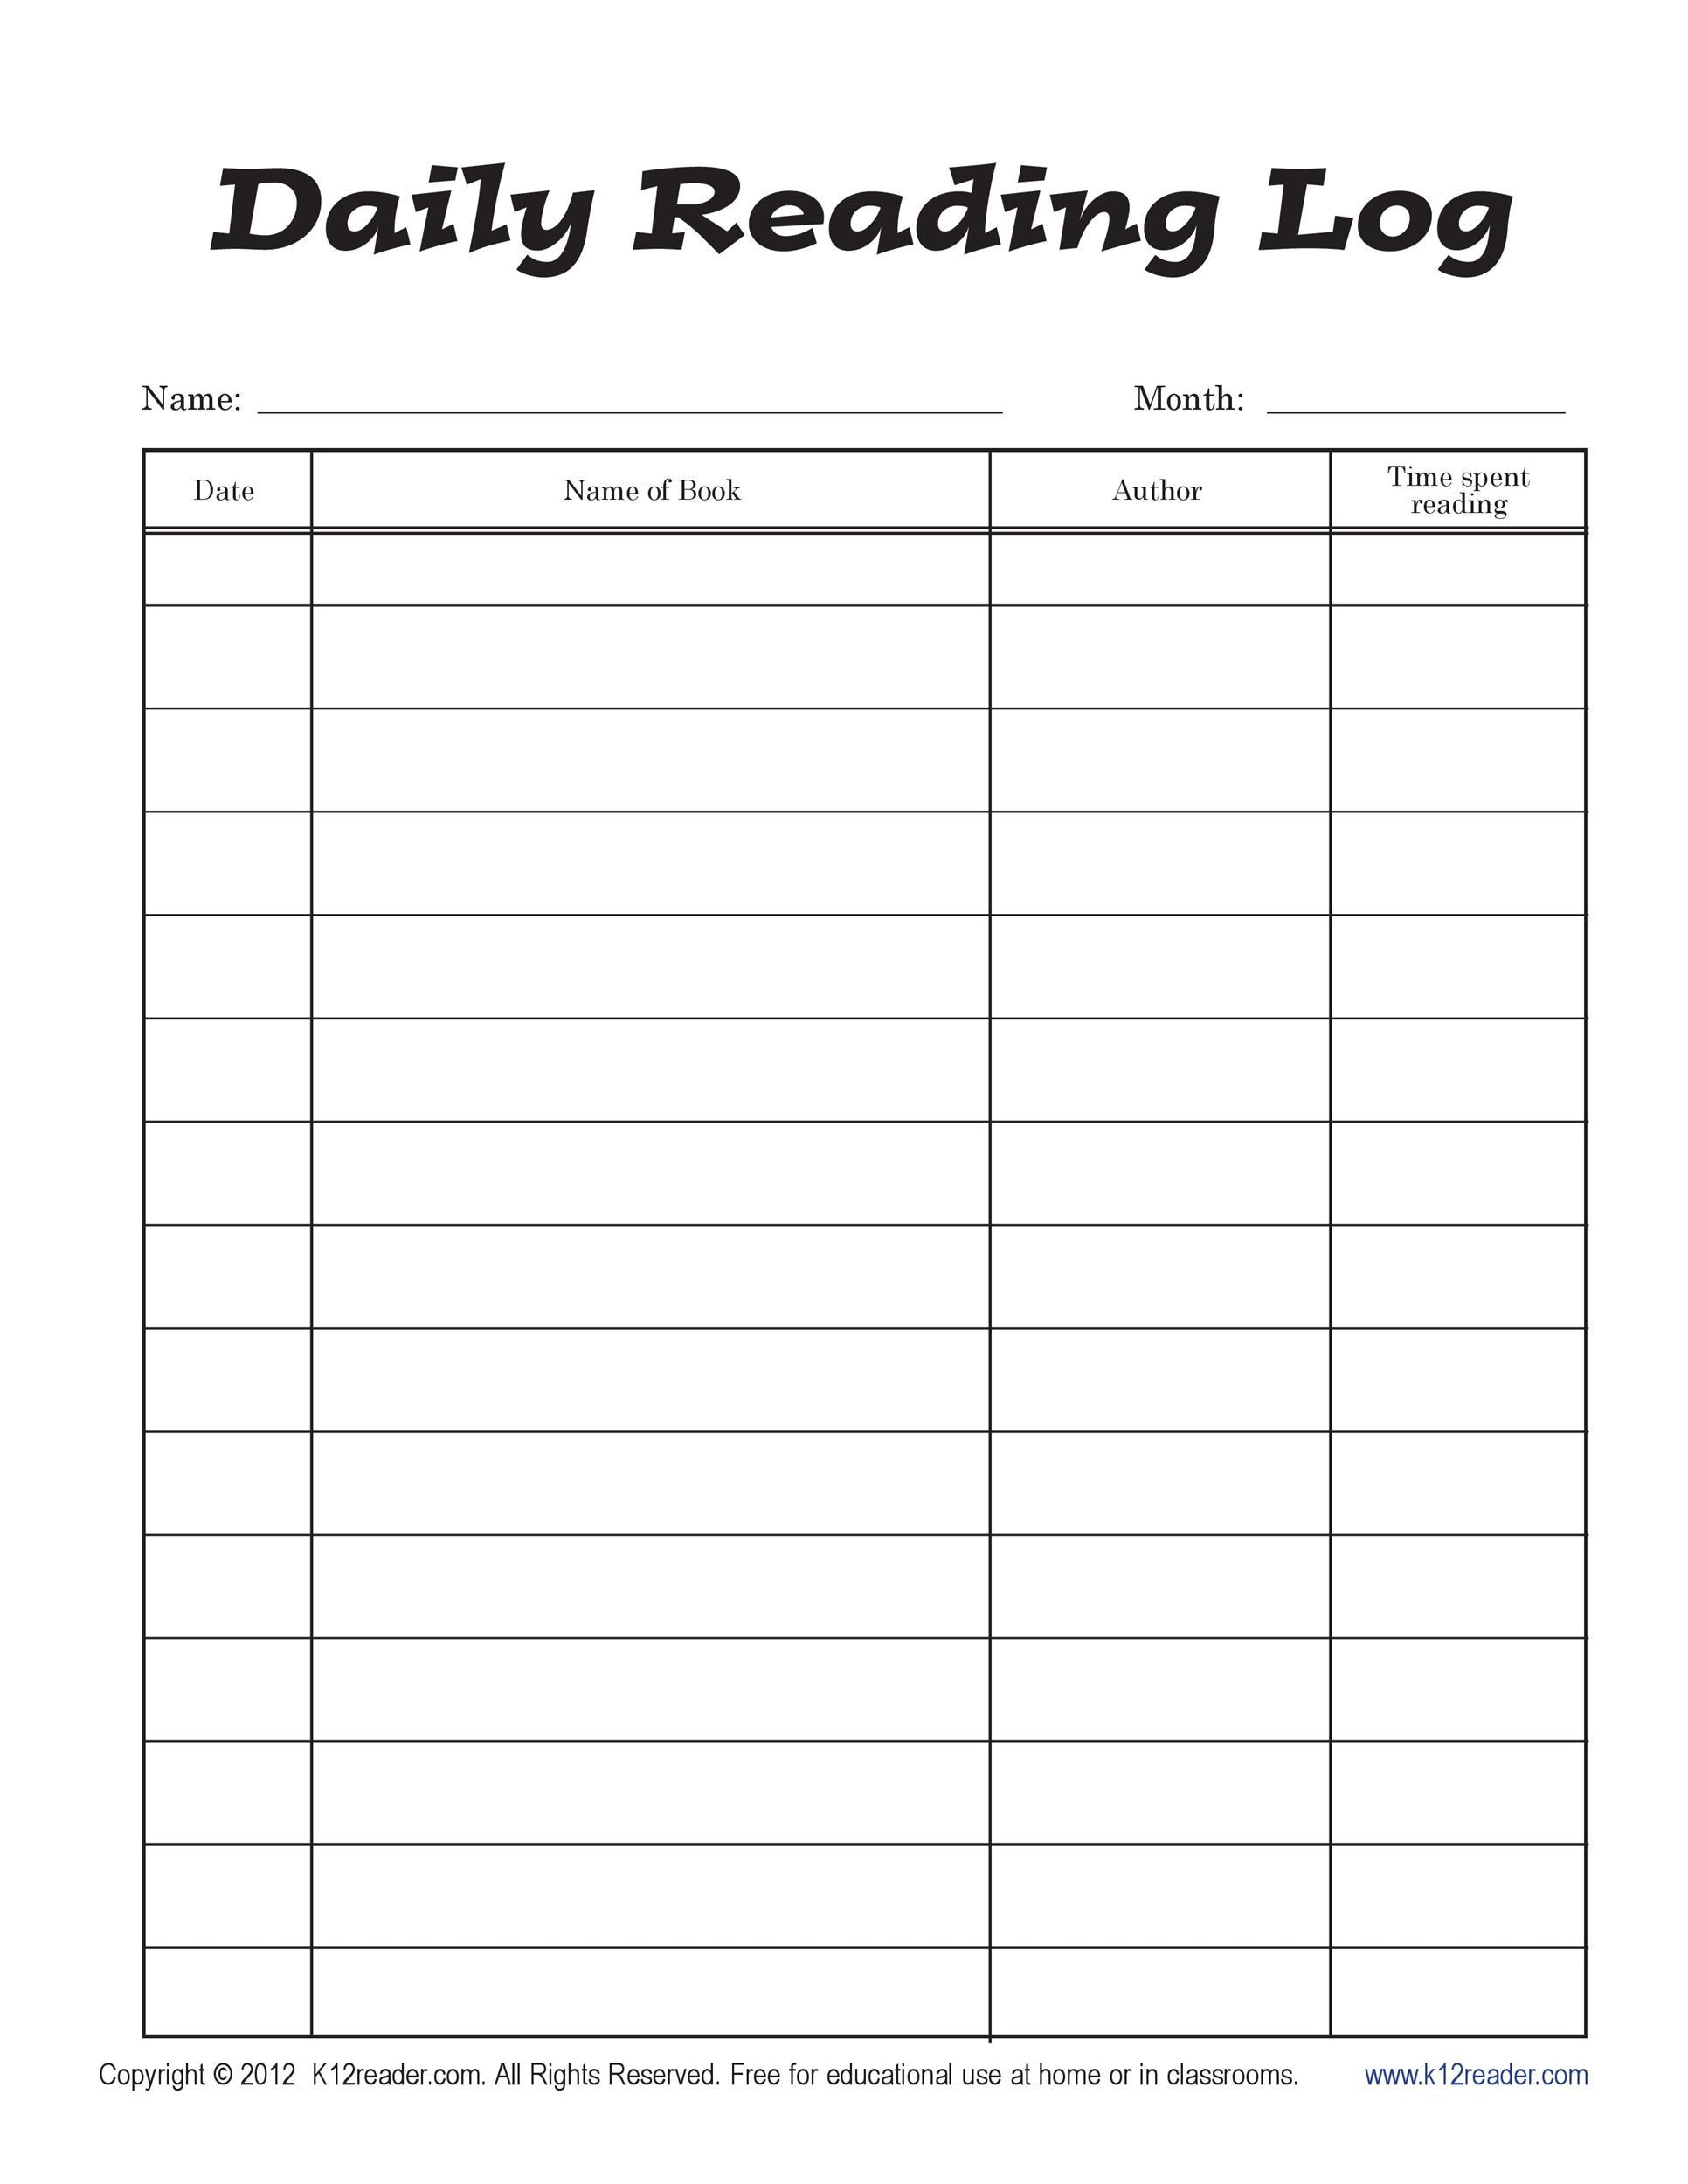 47 Printable Reading Log Templates For Kids, Middle School throughout Middle School Reading Log Template